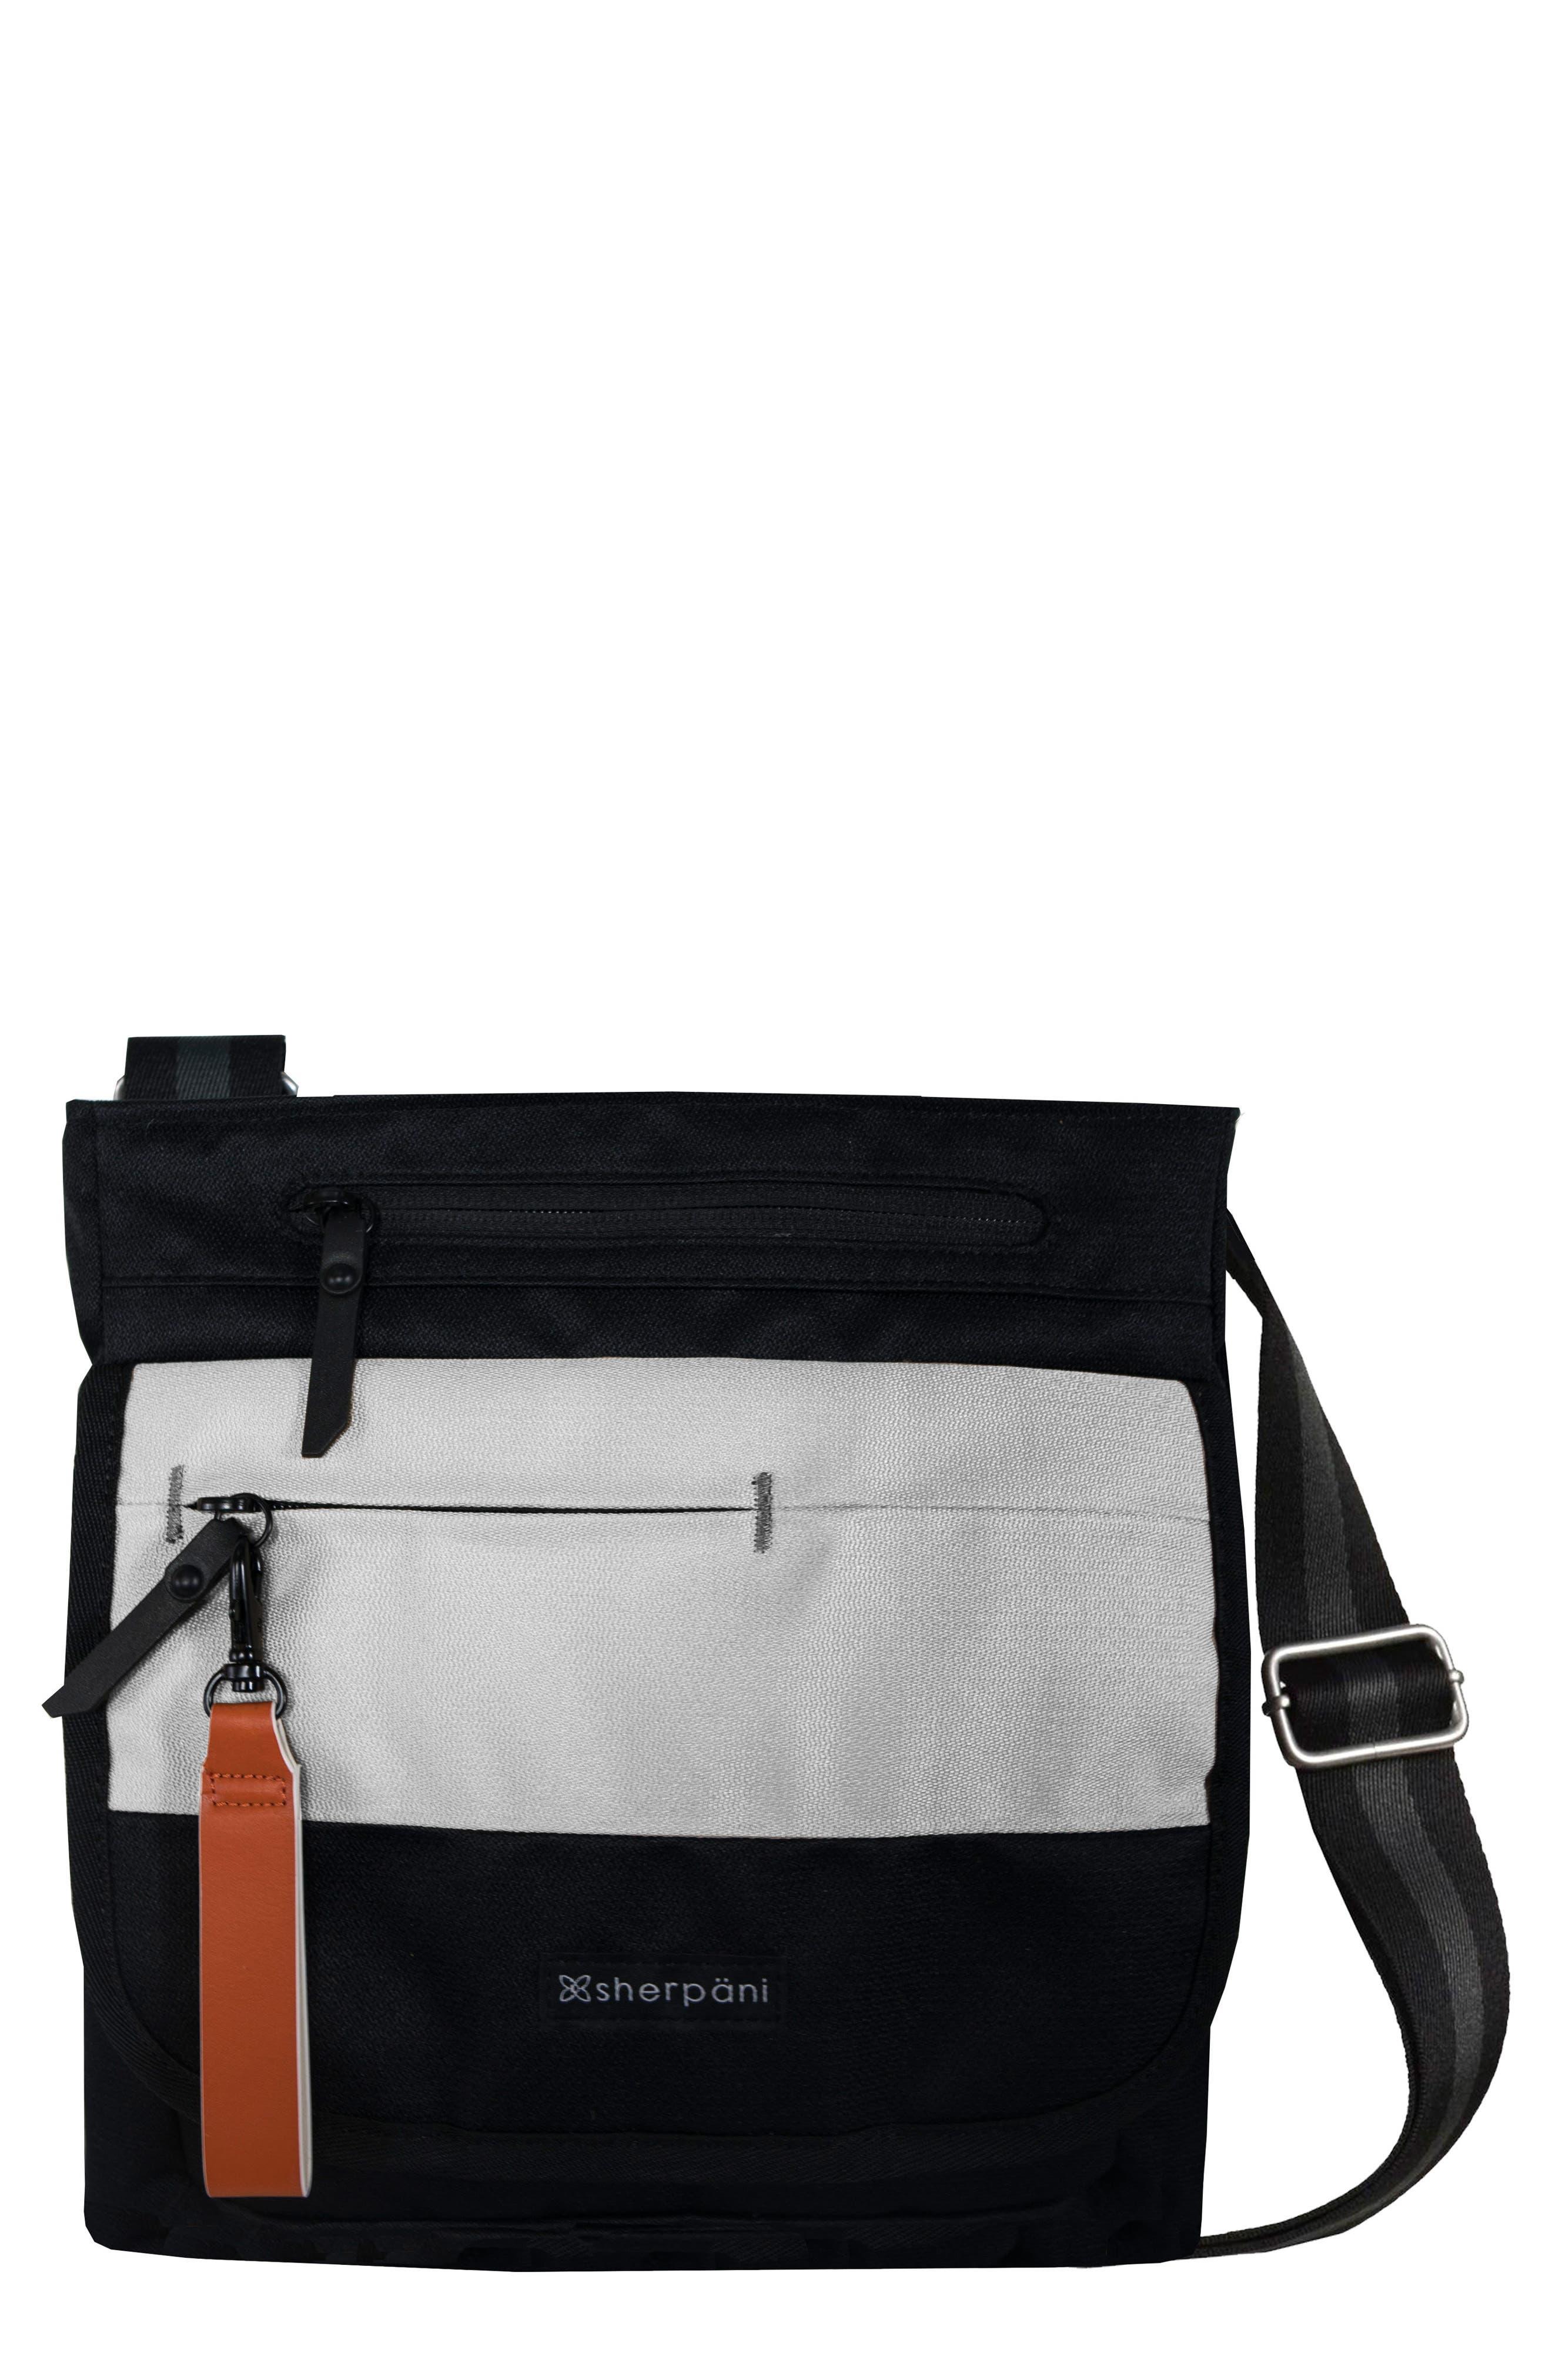 Sherpani Jag FRFID Crossbody Bag